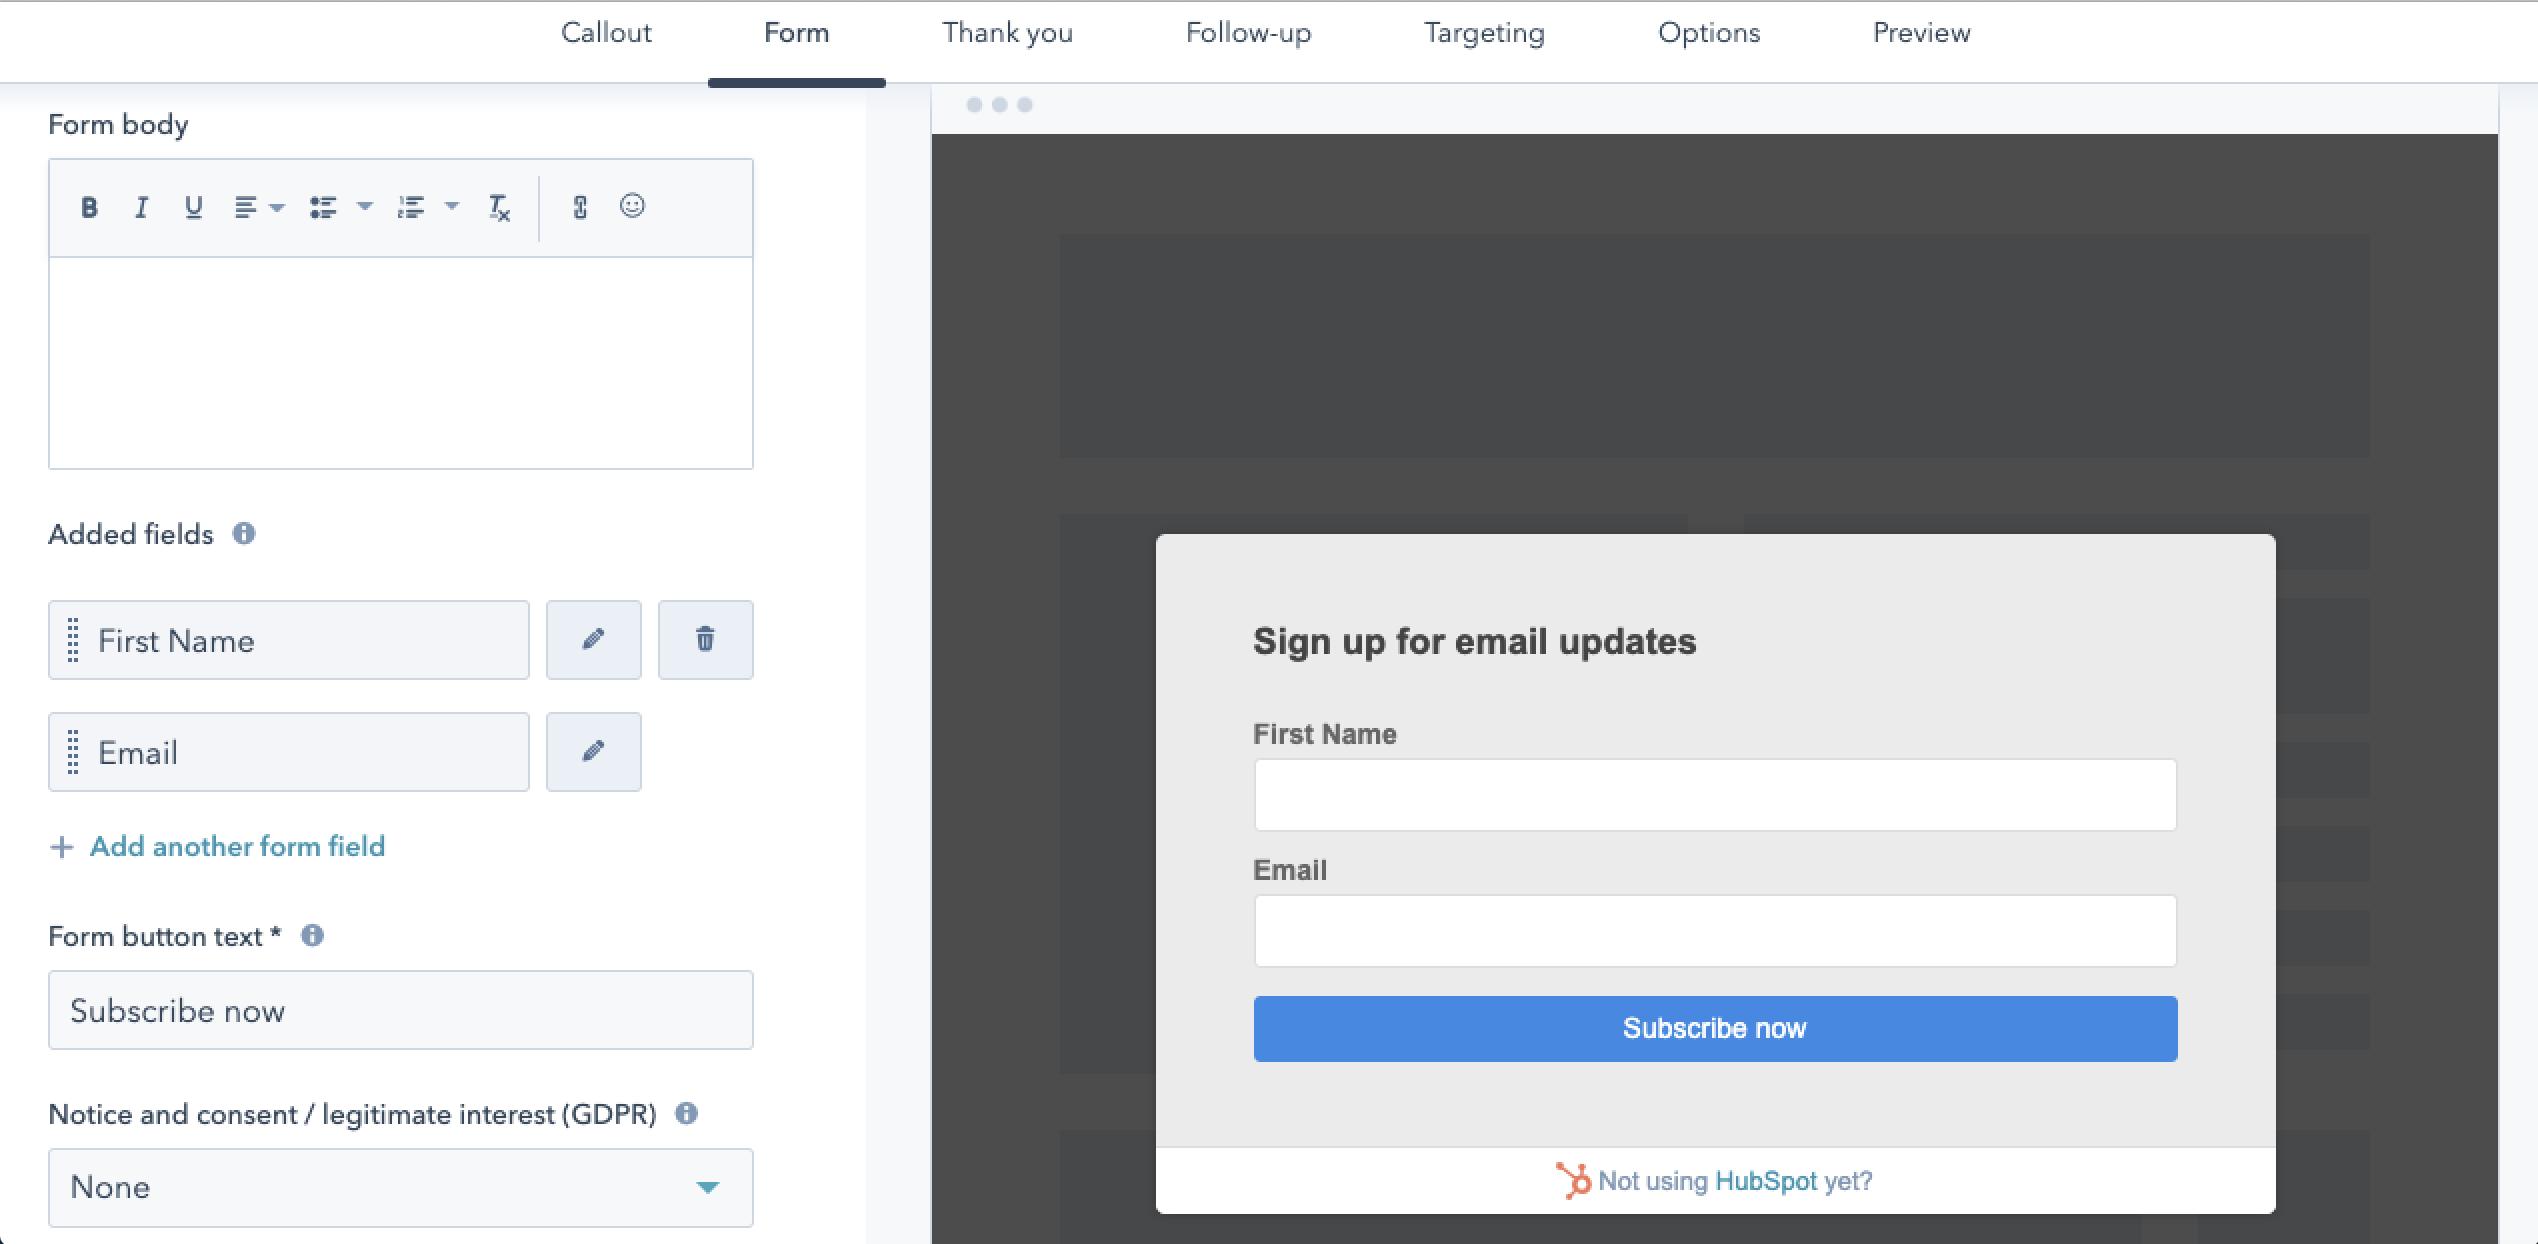 HubSpot Form Builder pop-up forms